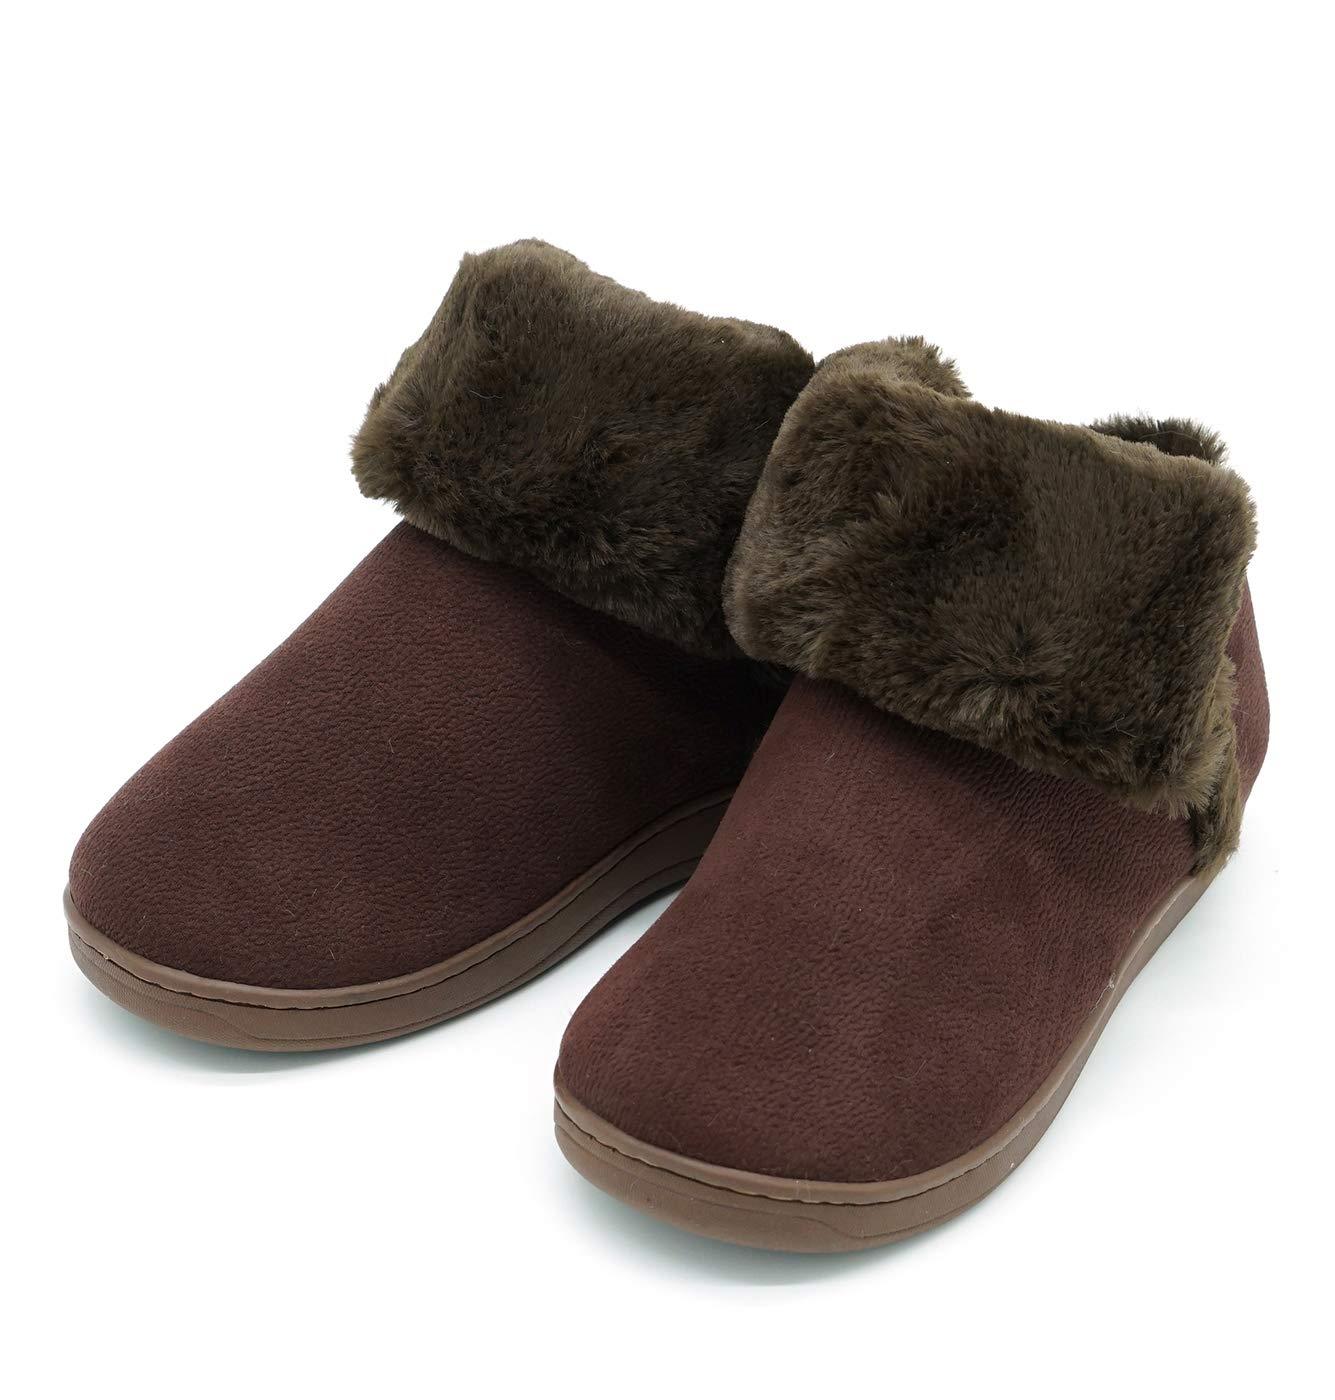 Baviue Men's Cool Fuzzy Anti-Slip Winter Outdoor Bootie Slippers Coffee 9-9.5 B(M) US